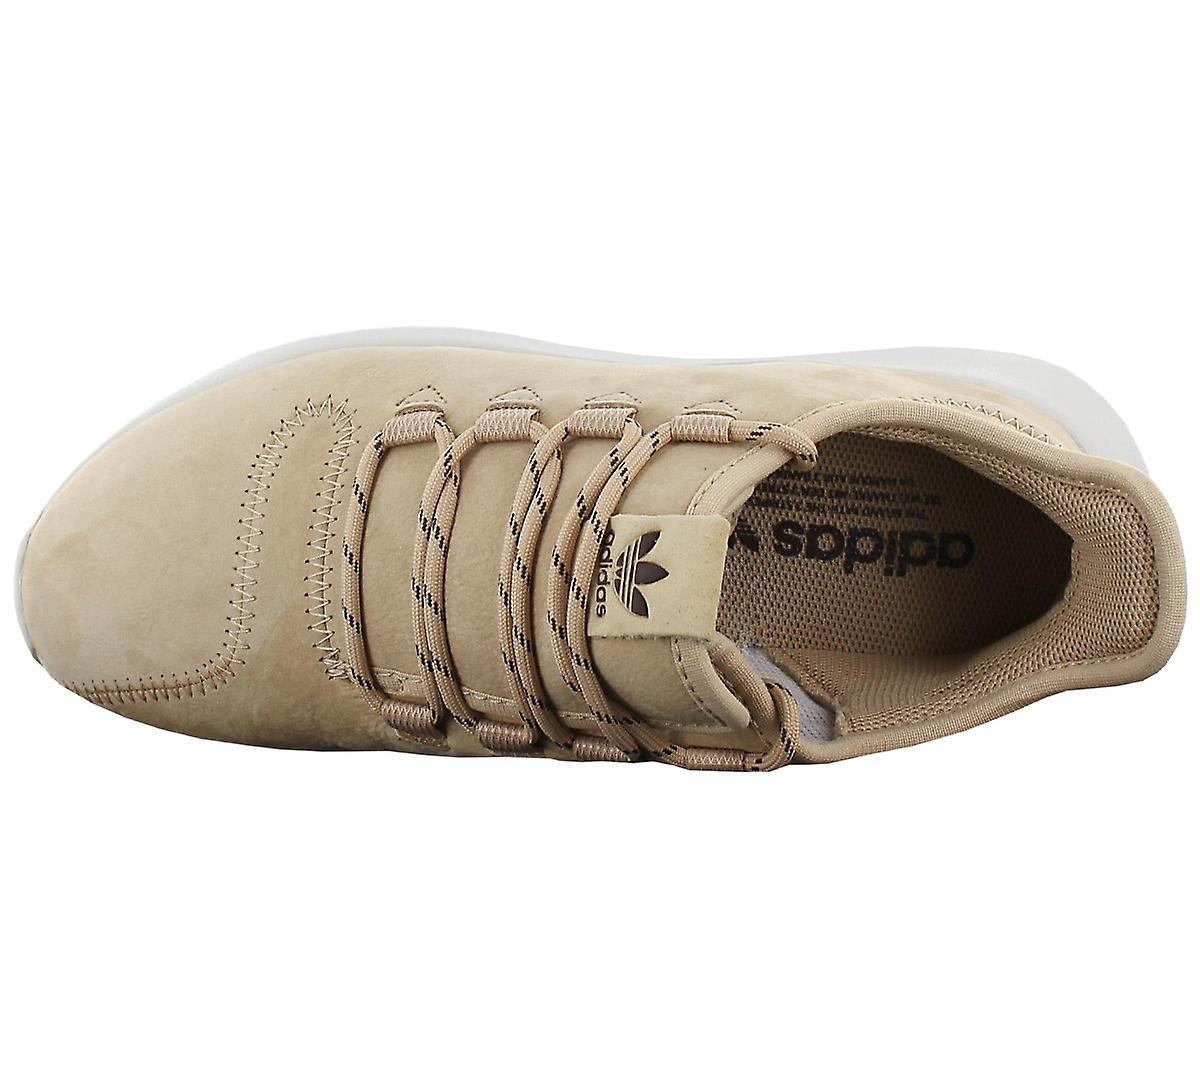 Adidas Tubular Shadow Bb6231 Damen Schuhe Beige Sneakers Sportschuhe